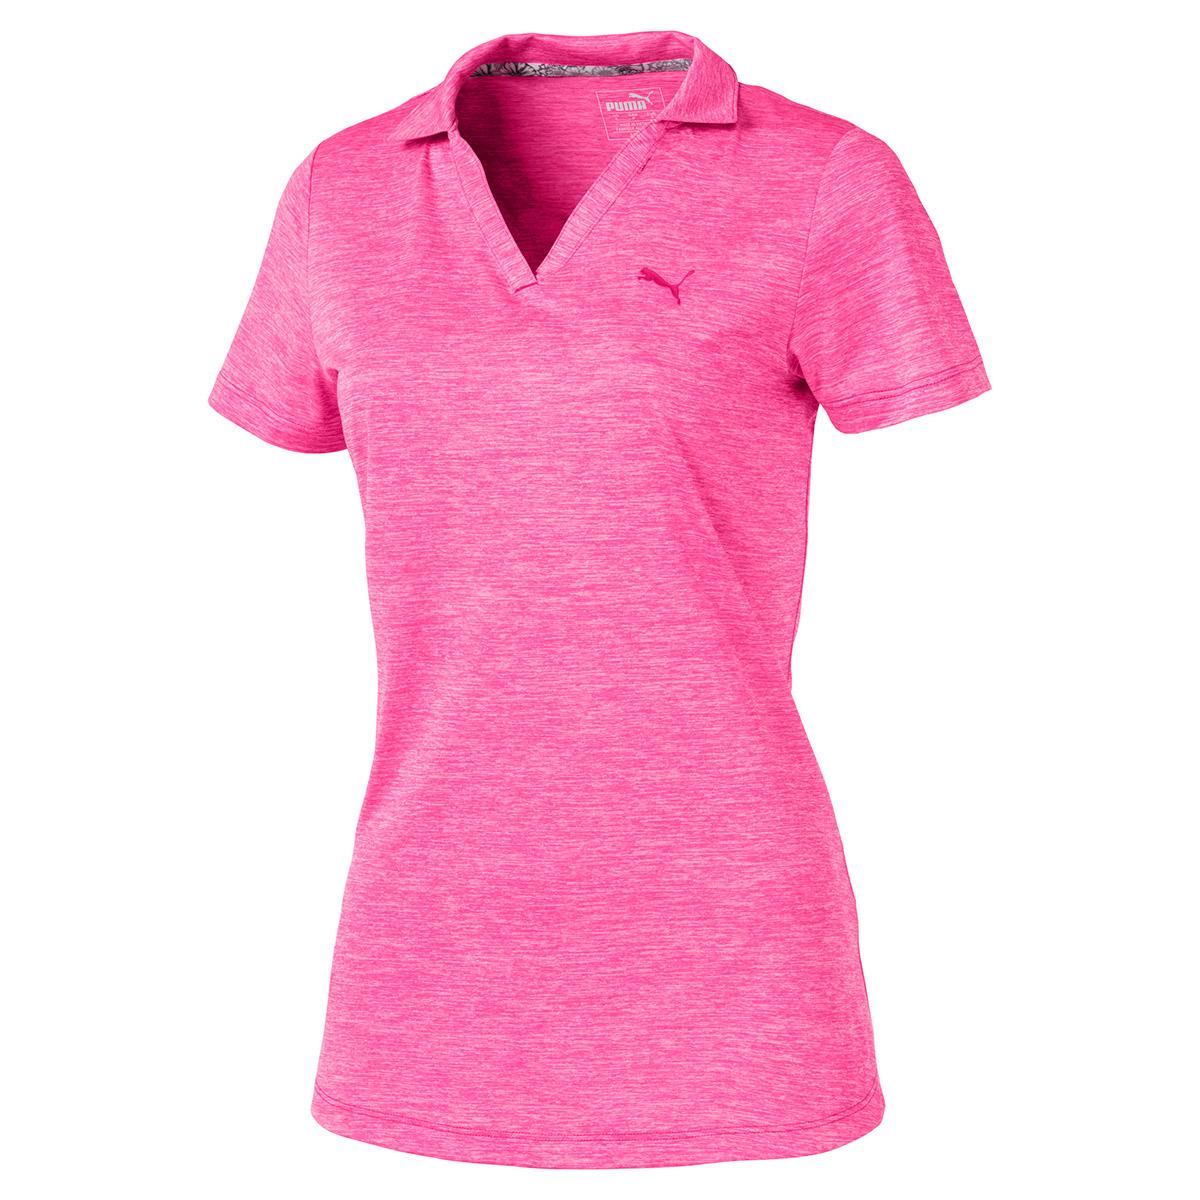 PUMA Golf Super Soft Ladies Polo Shirt from american golf 060899cc1609